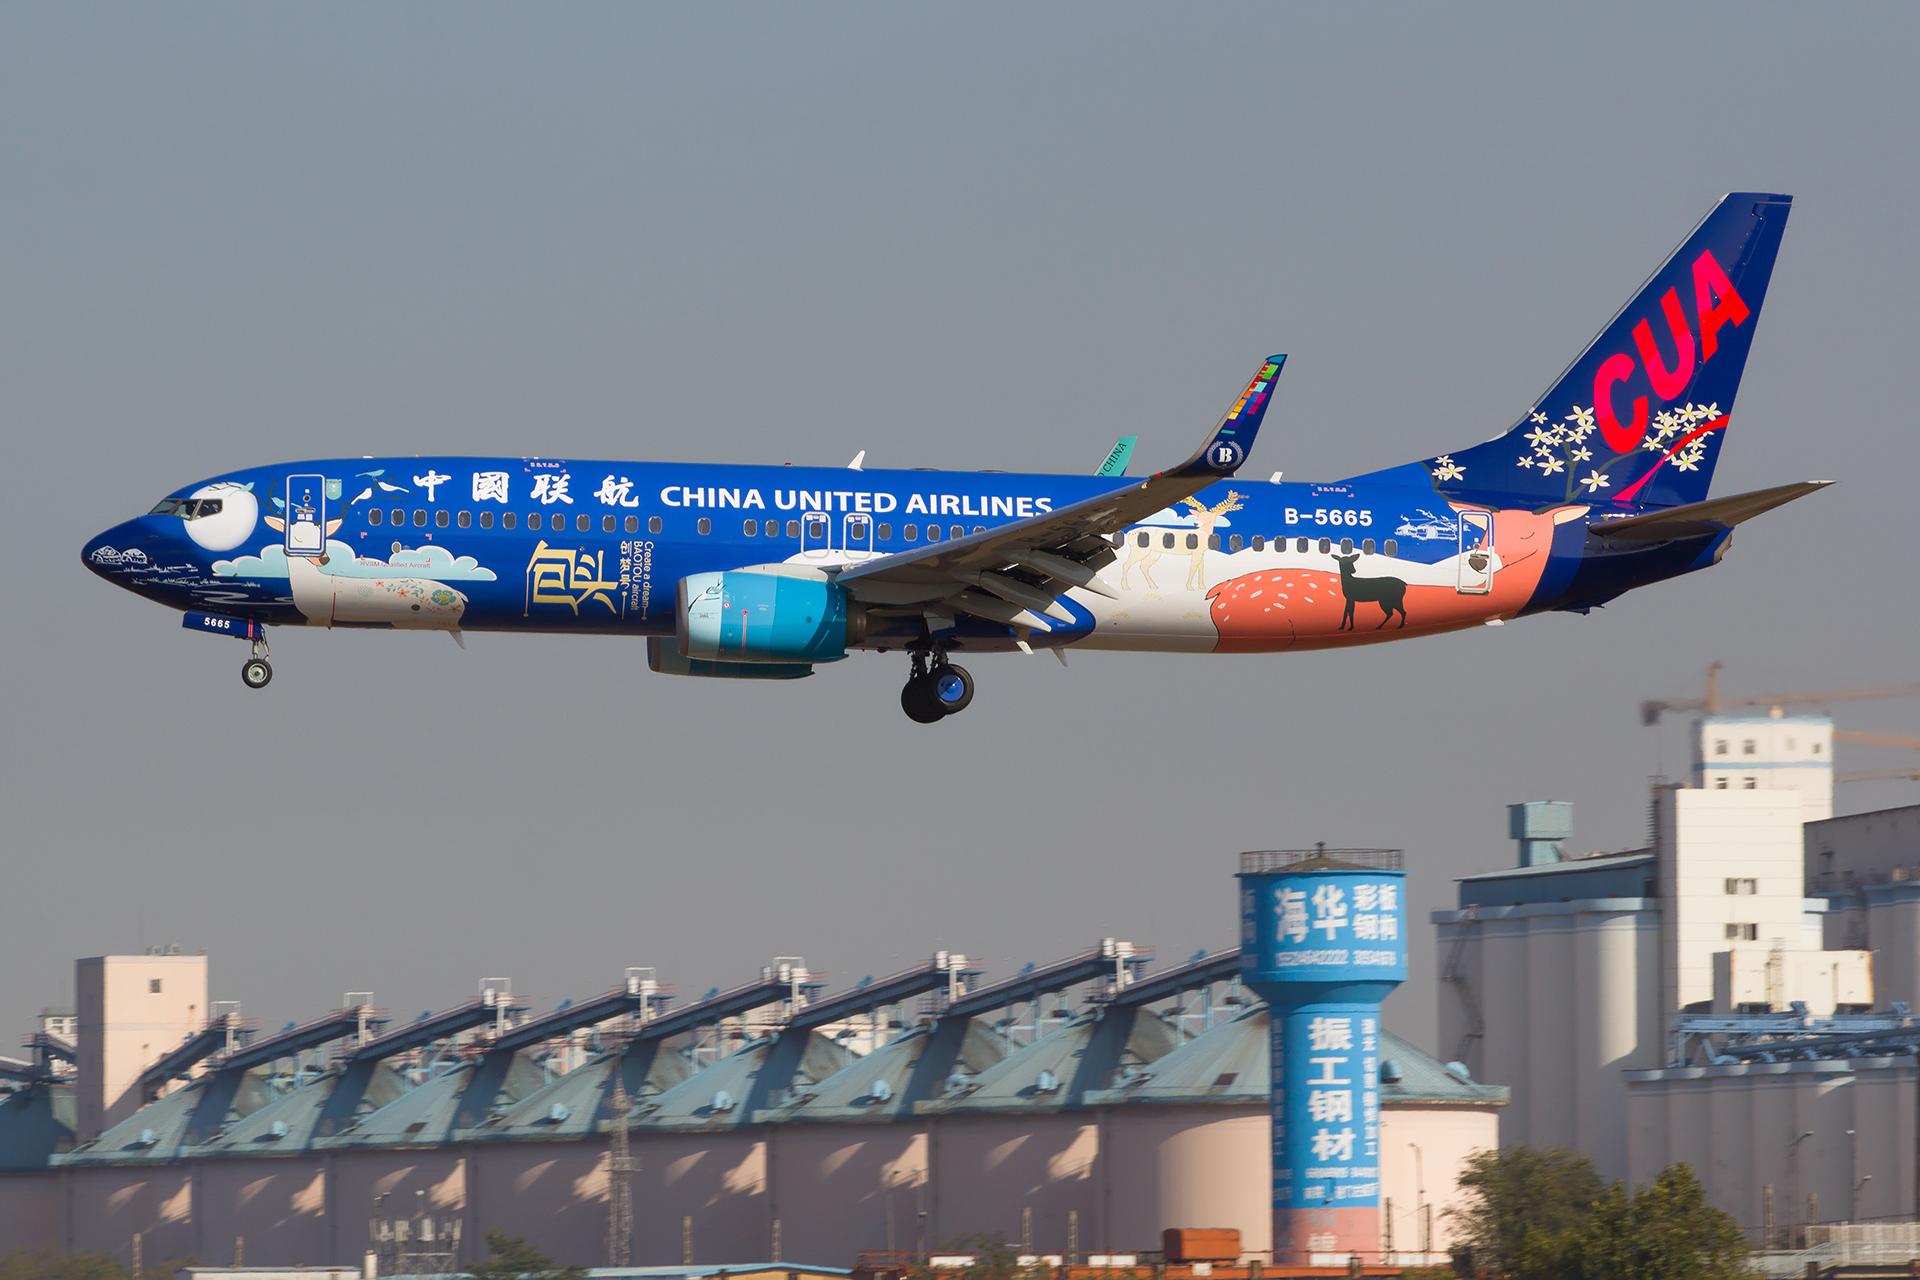 [DLC]。。。中国联航-包头创梦号。。。 BOEING 737-800 B-5665 中国大连国际机场